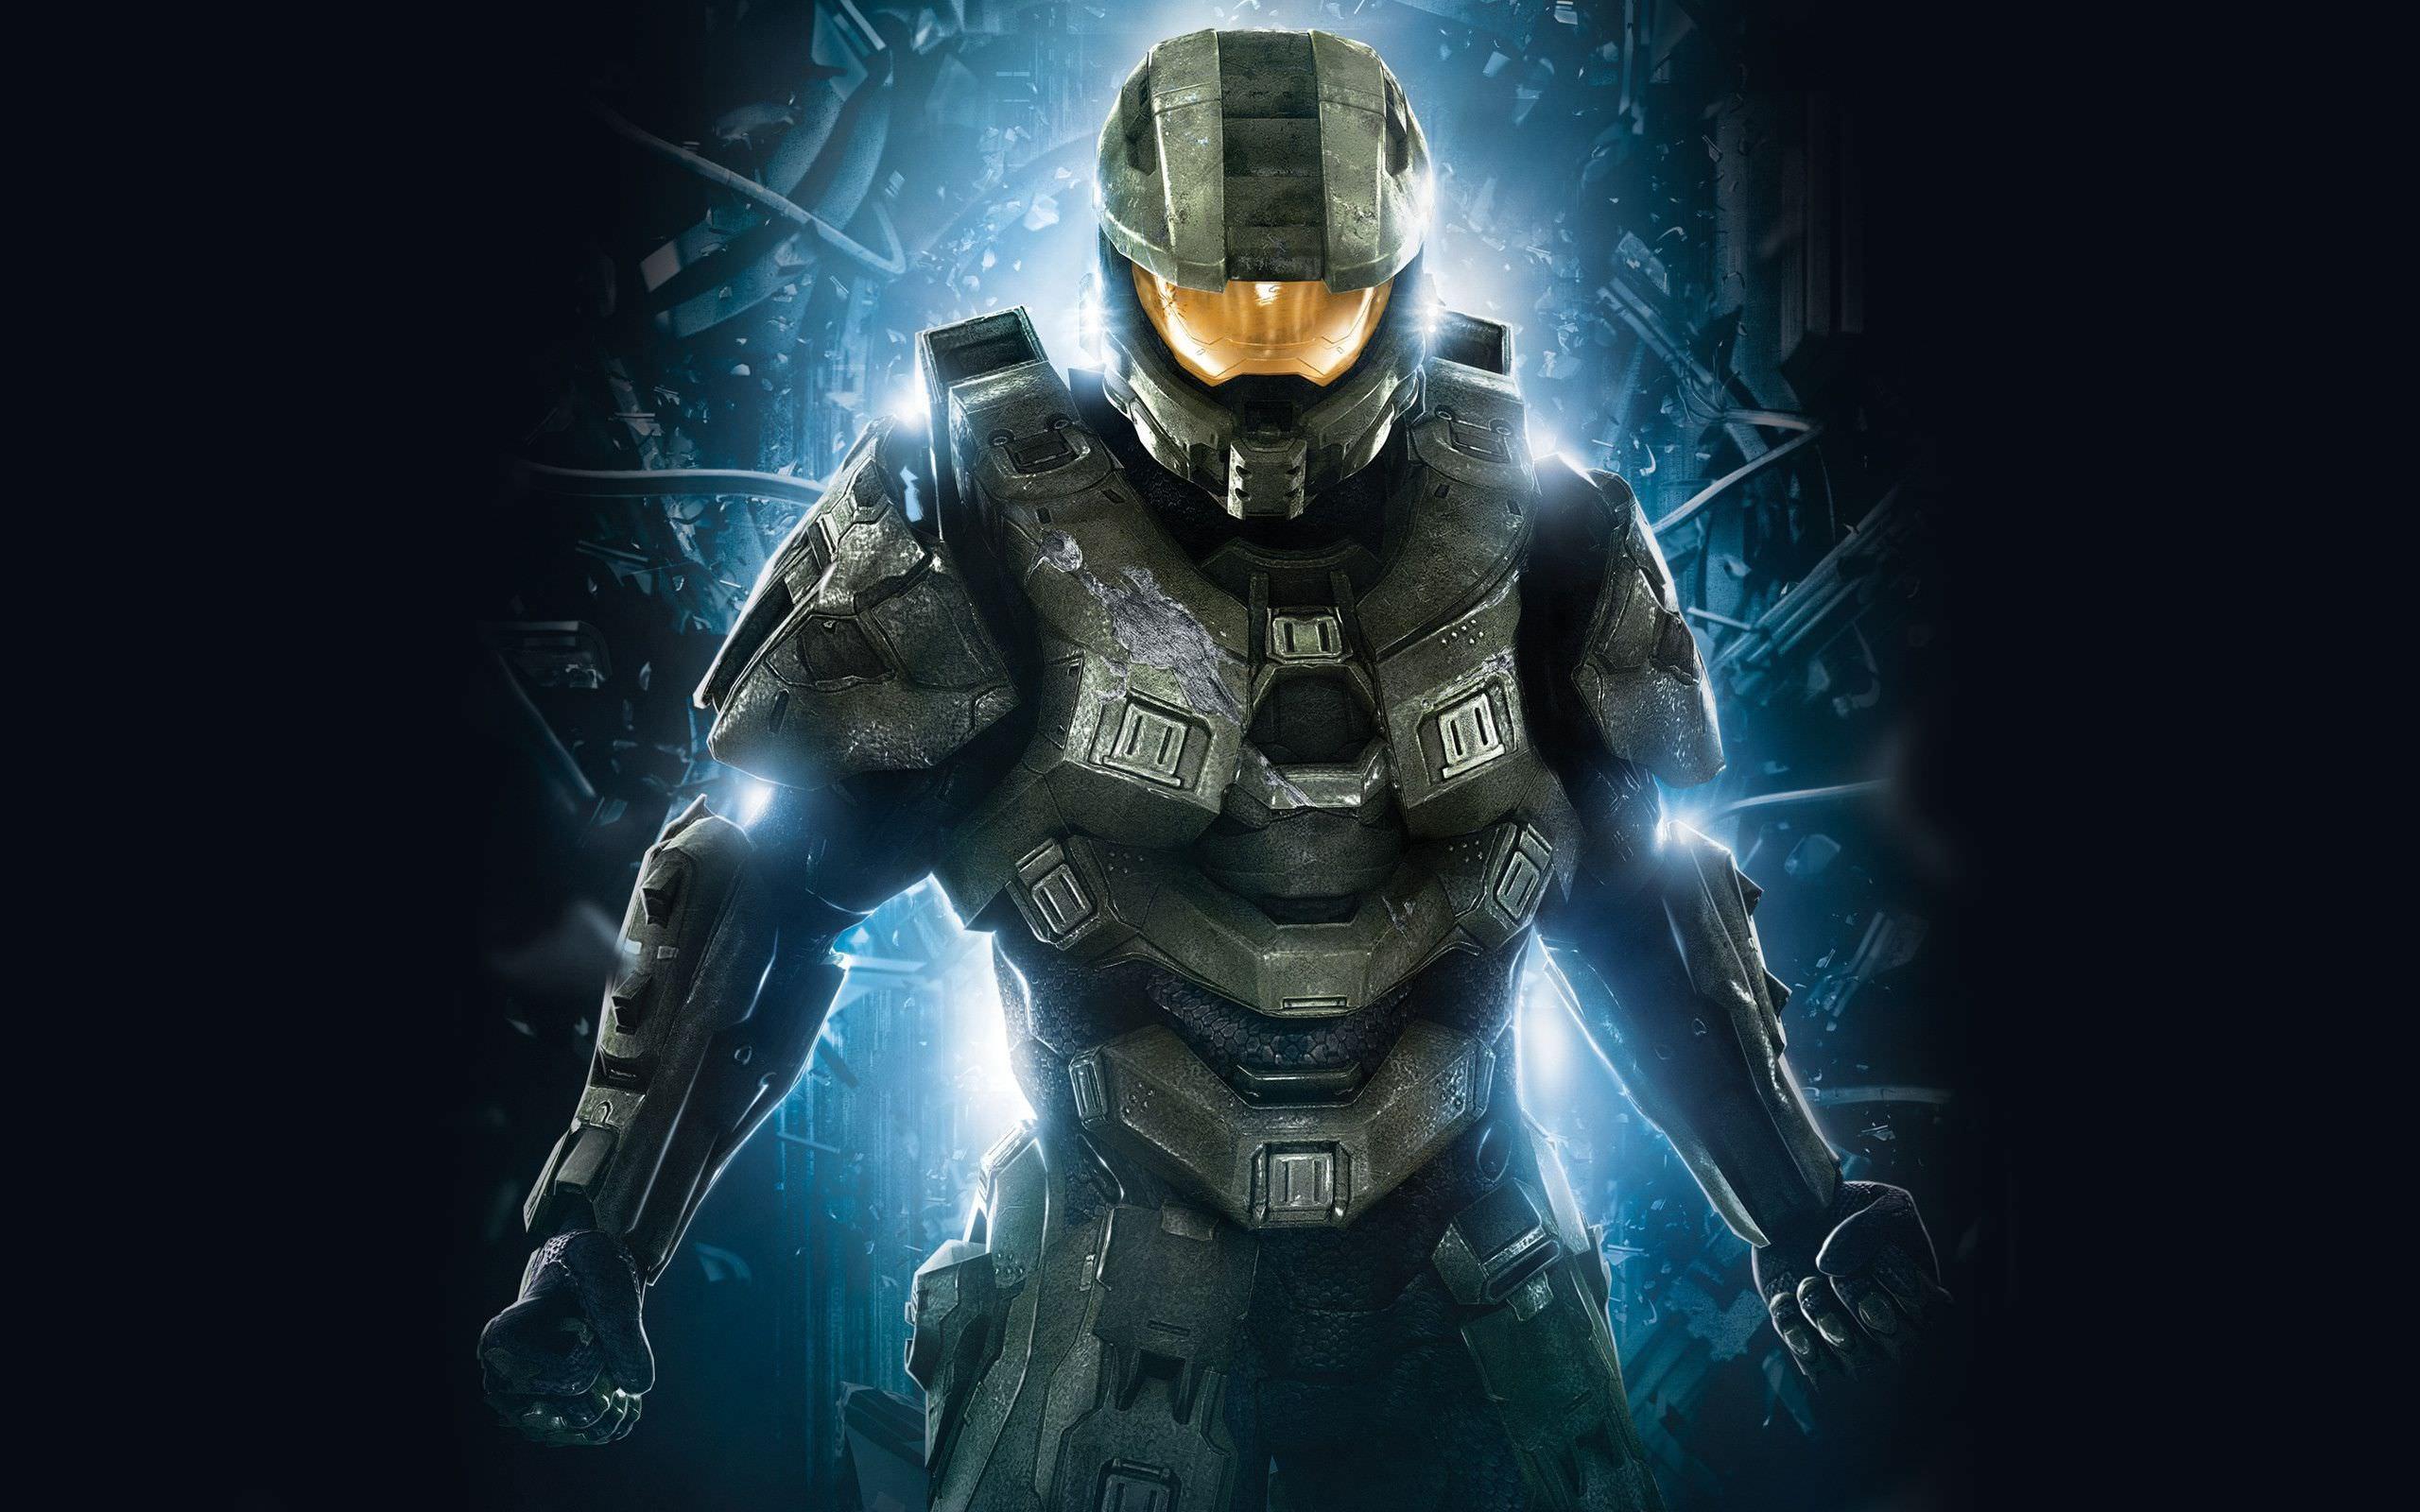 Fantastic Halo Wallpaper